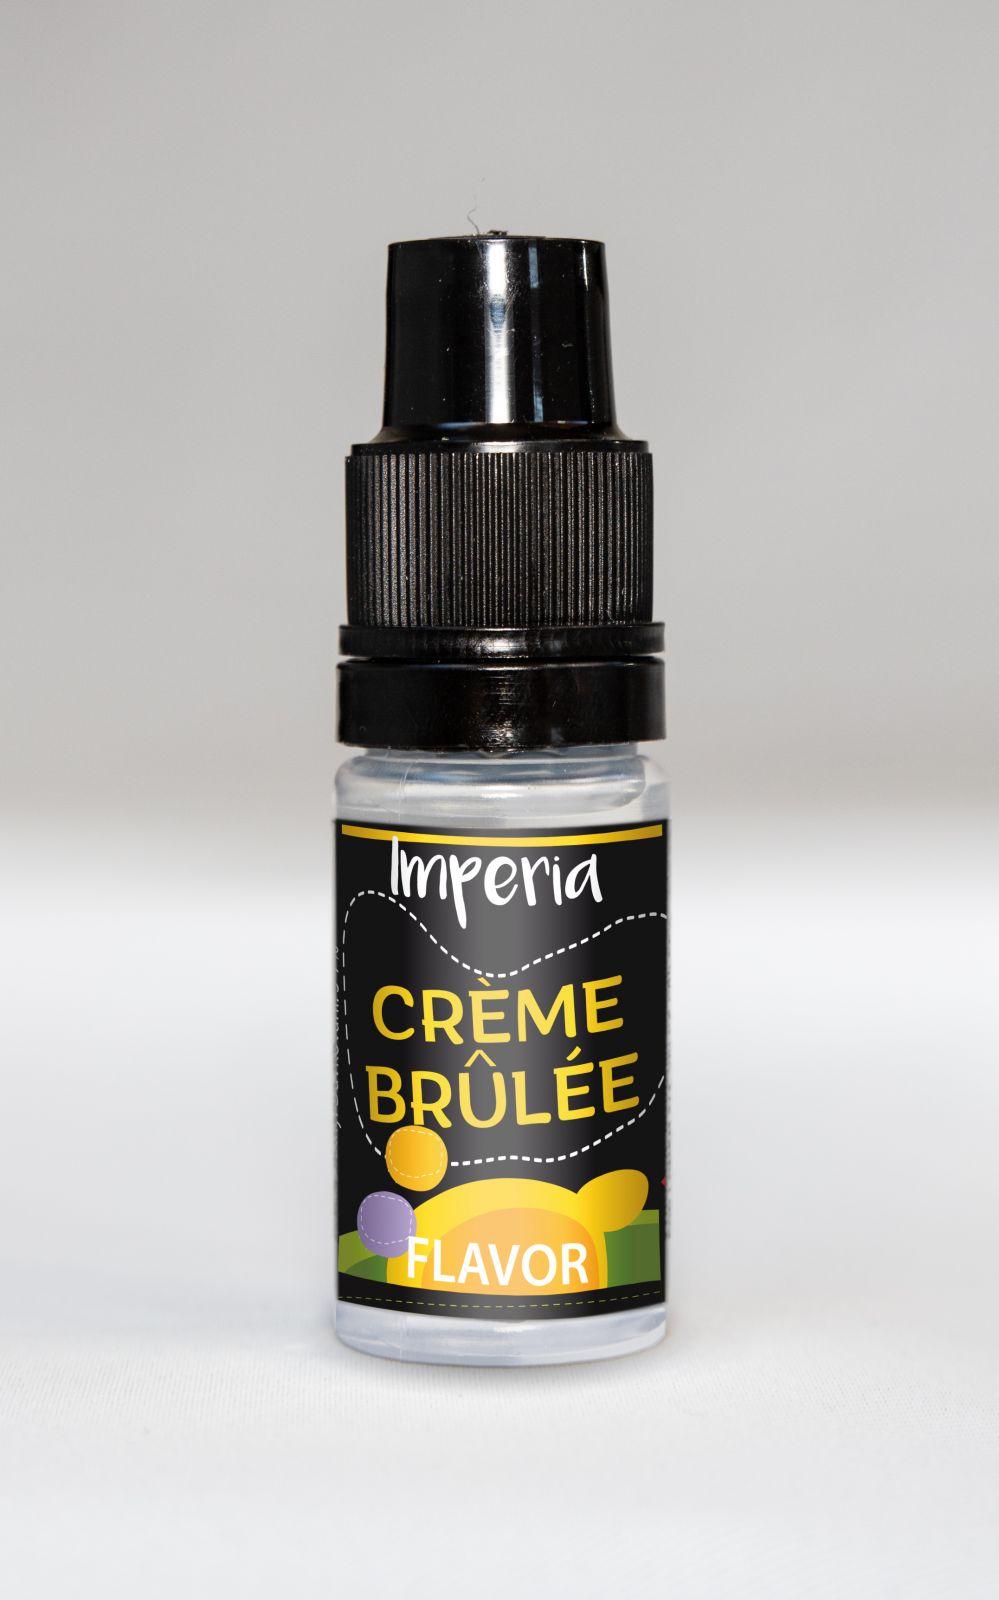 CREME BRULEE - Aroma Imperia Black Label Boudoir Samadhi s.r.o.